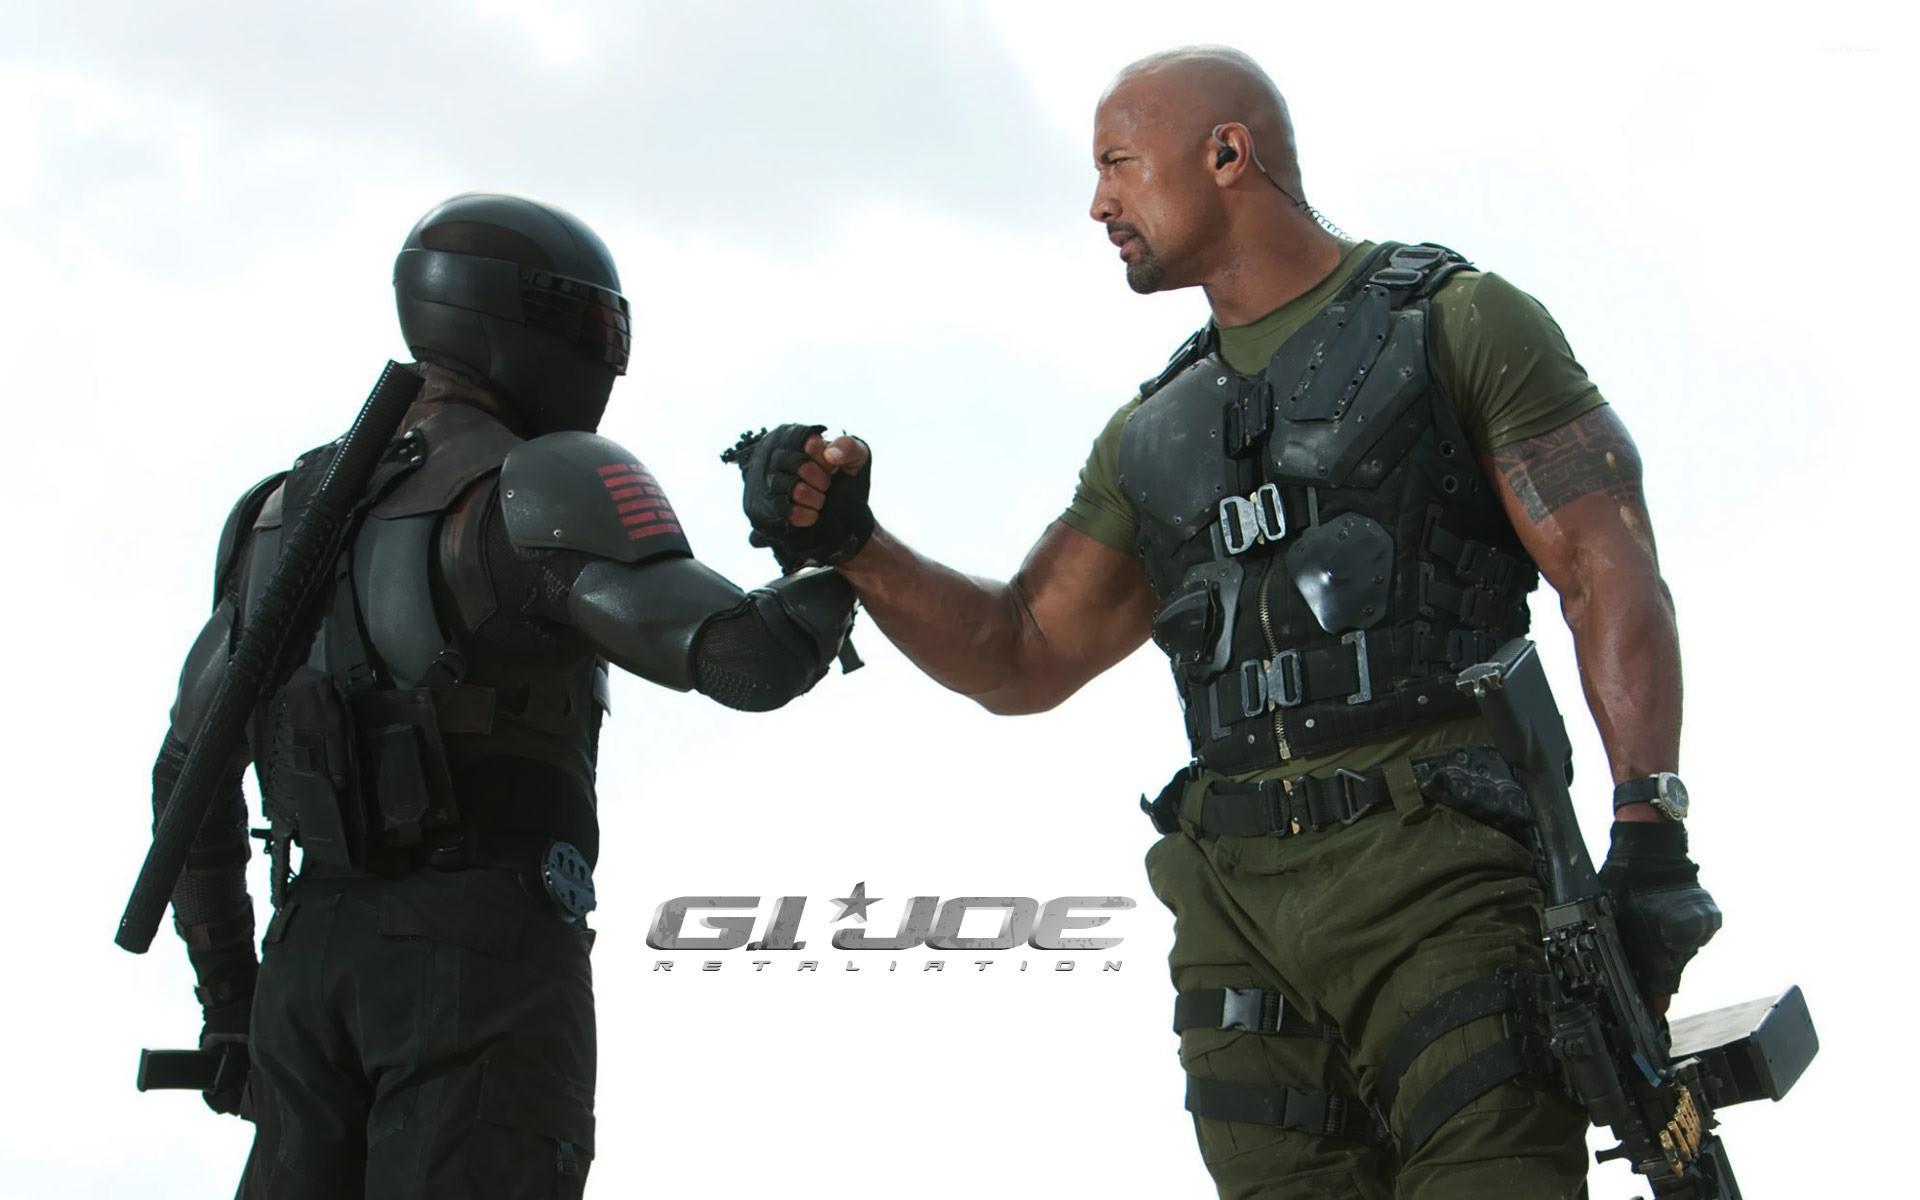 Res: 1920x1200, Roadblock and Snake Eyes - G.I. Joe: Retaliation wallpaper